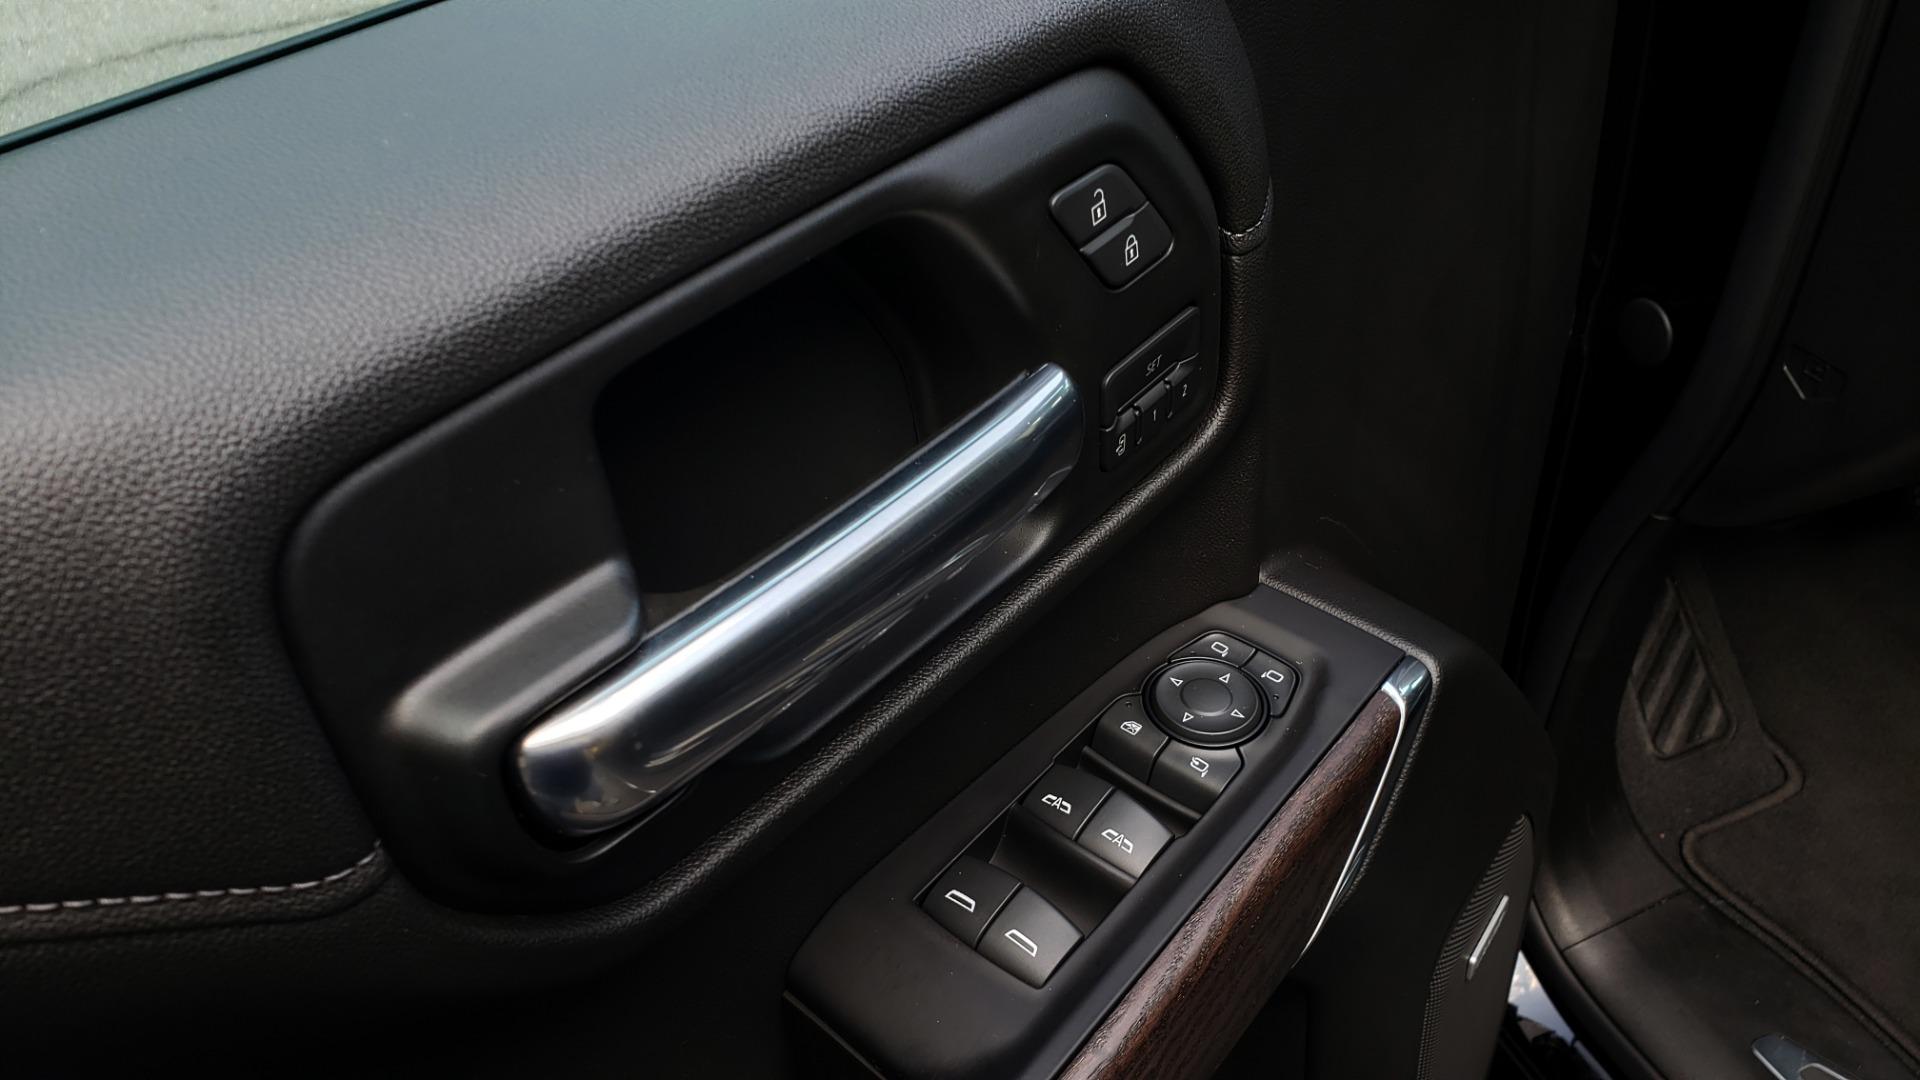 Used 2019 GMC SIERRA 1500 DENALI ULTIMATE 4WD / NAV / TECH PKG / DRVR ALRT for sale Sold at Formula Imports in Charlotte NC 28227 41